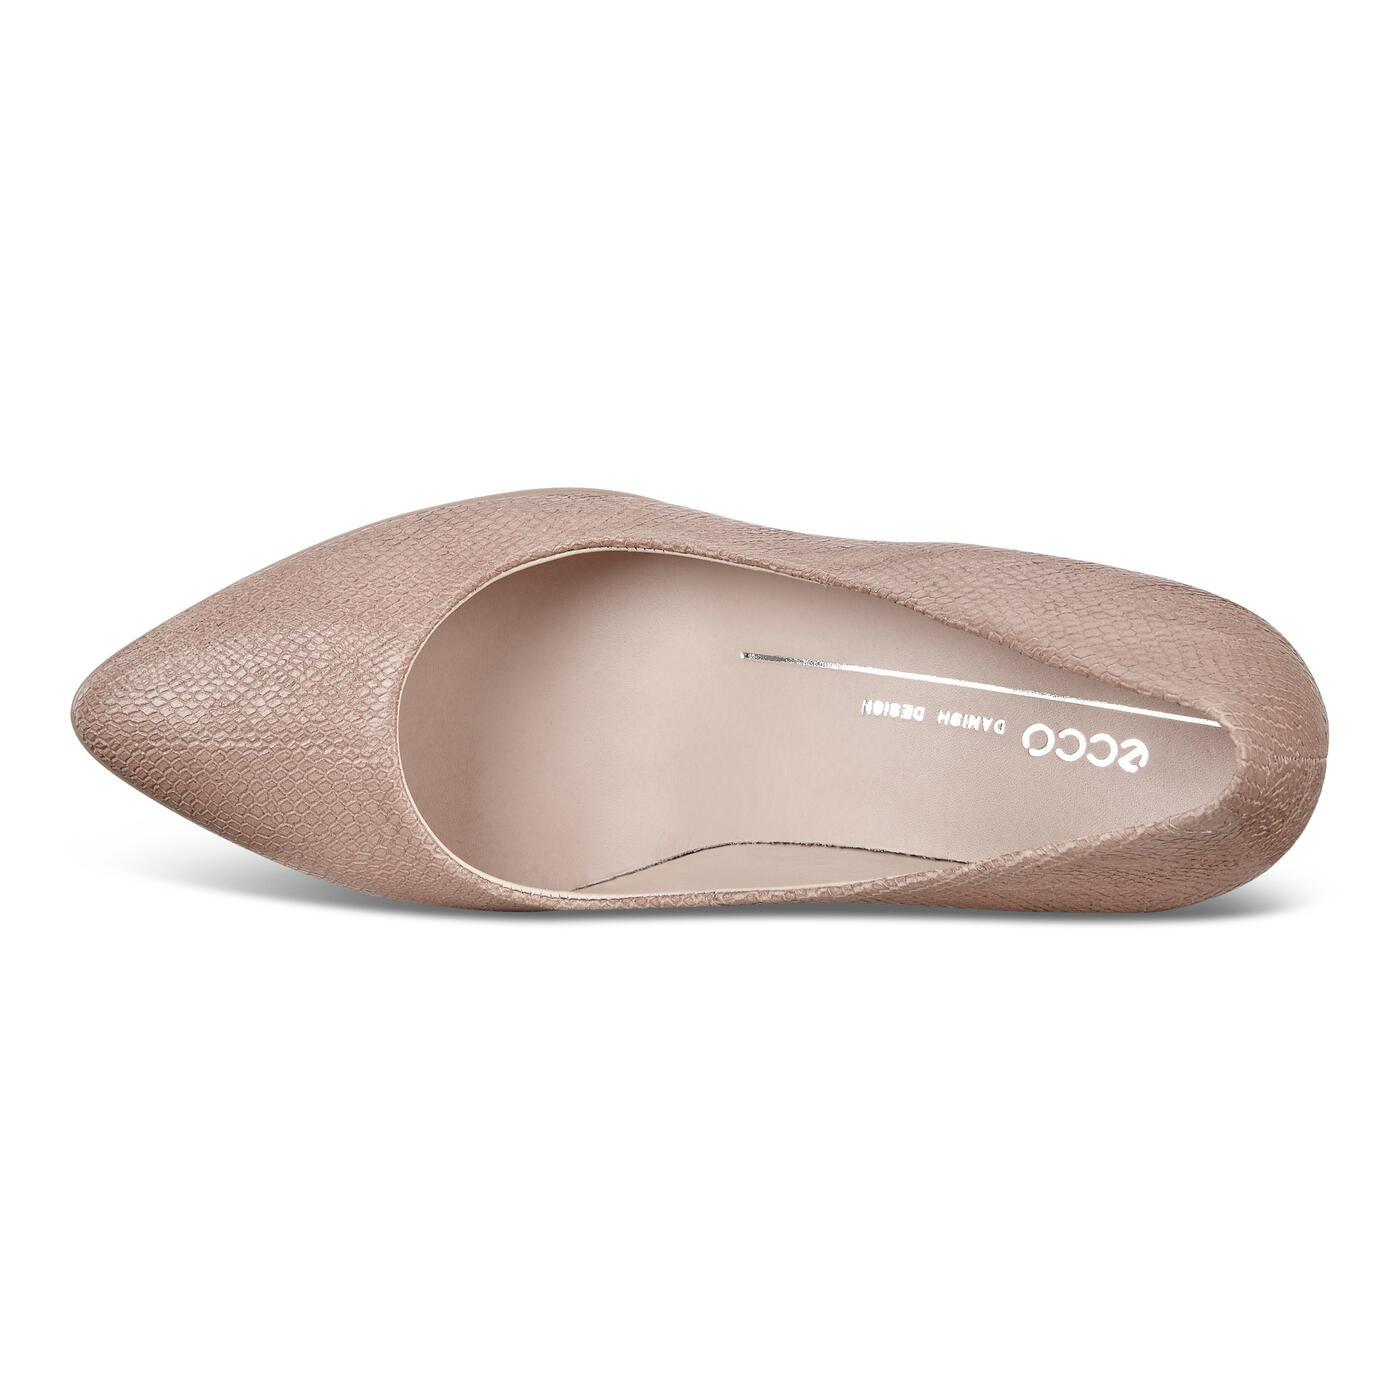 ECCO Shape 45 Pointy Sleek